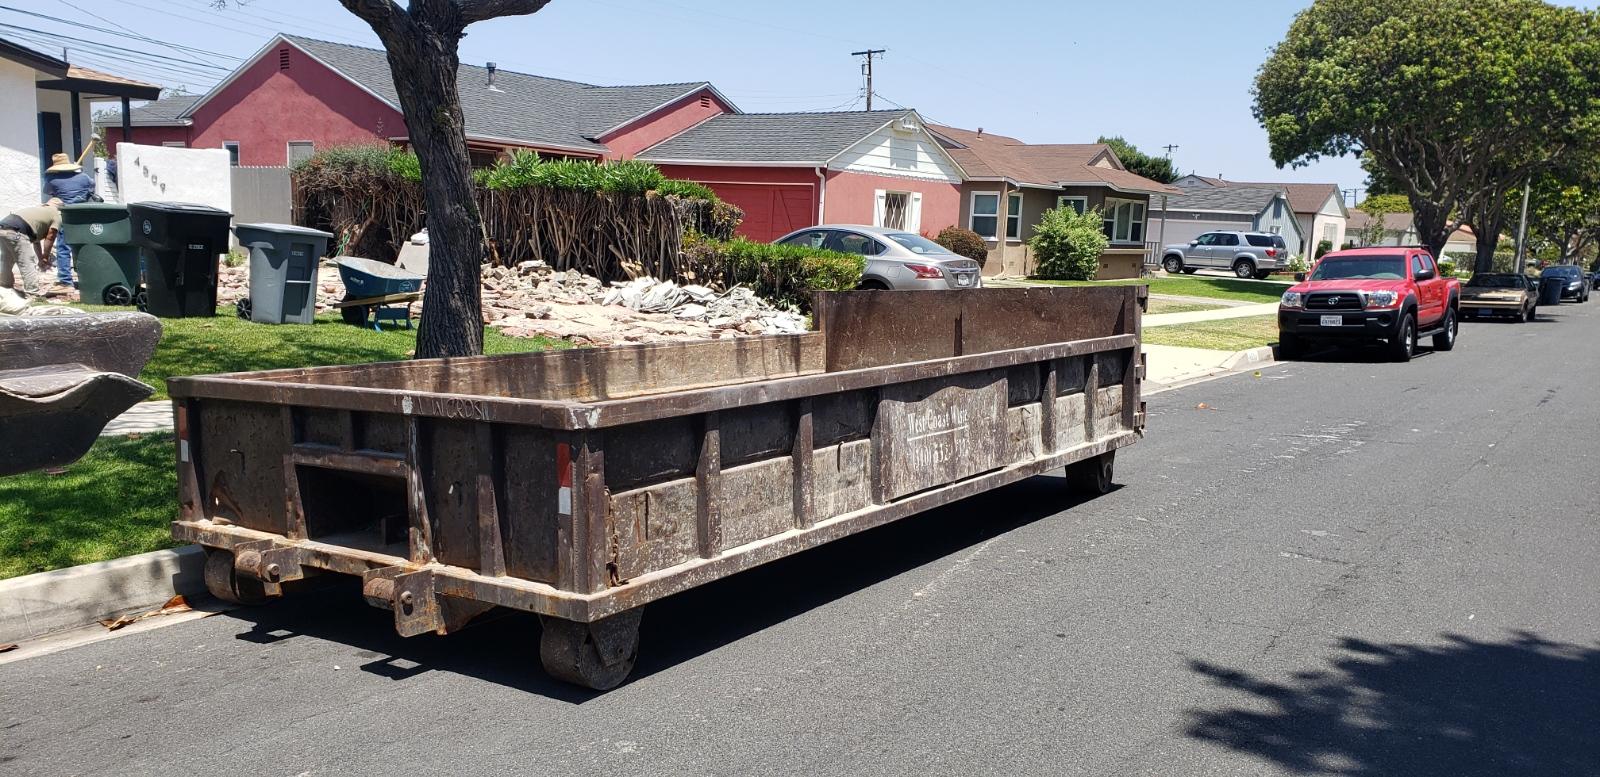 Concrete dumpster rental in Torrance